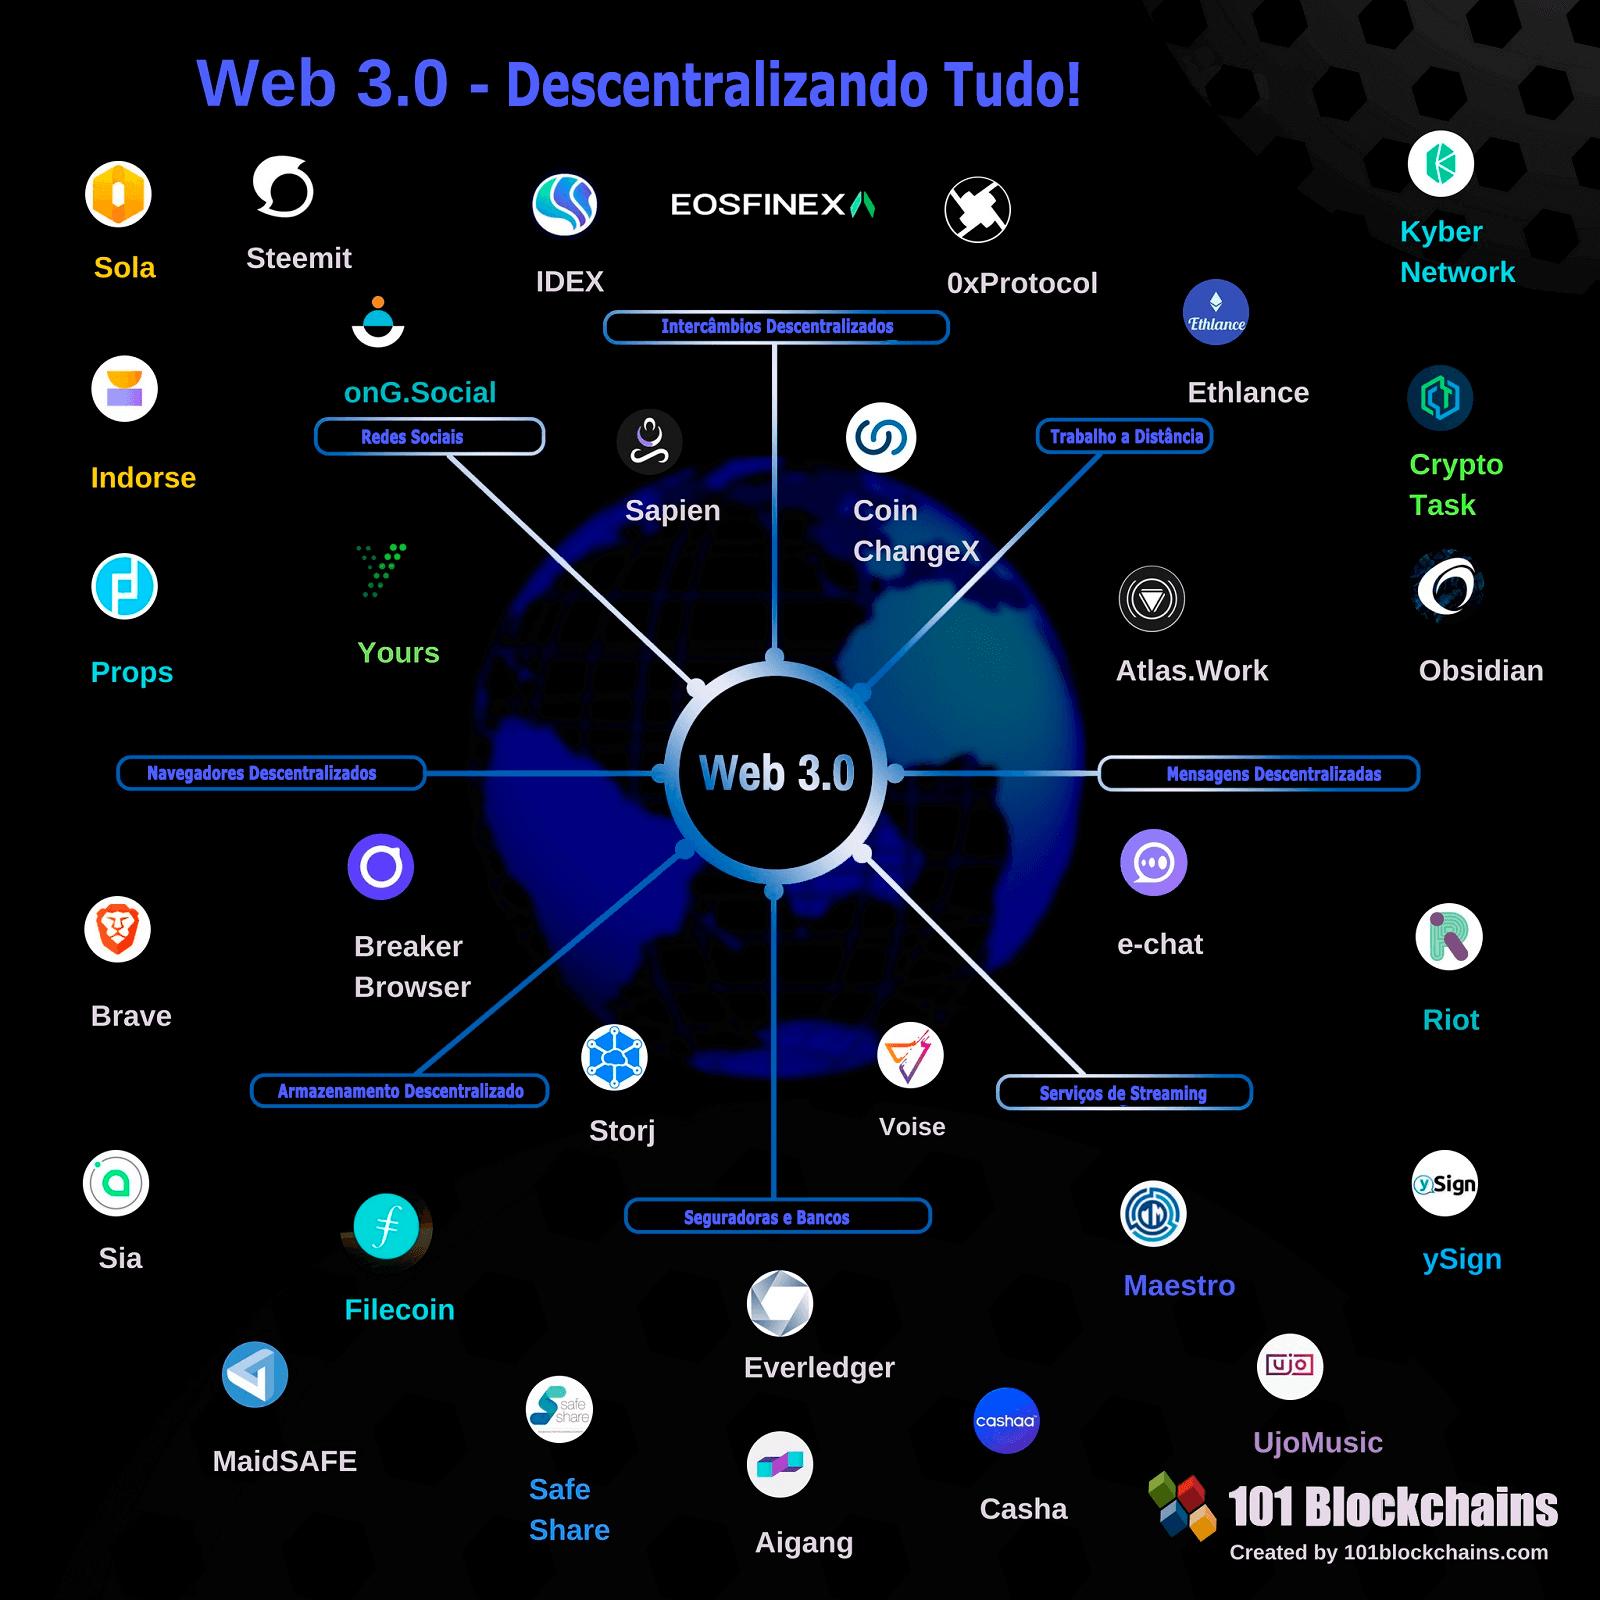 Web 3.0 - Descentralizando Tudo Infográfico